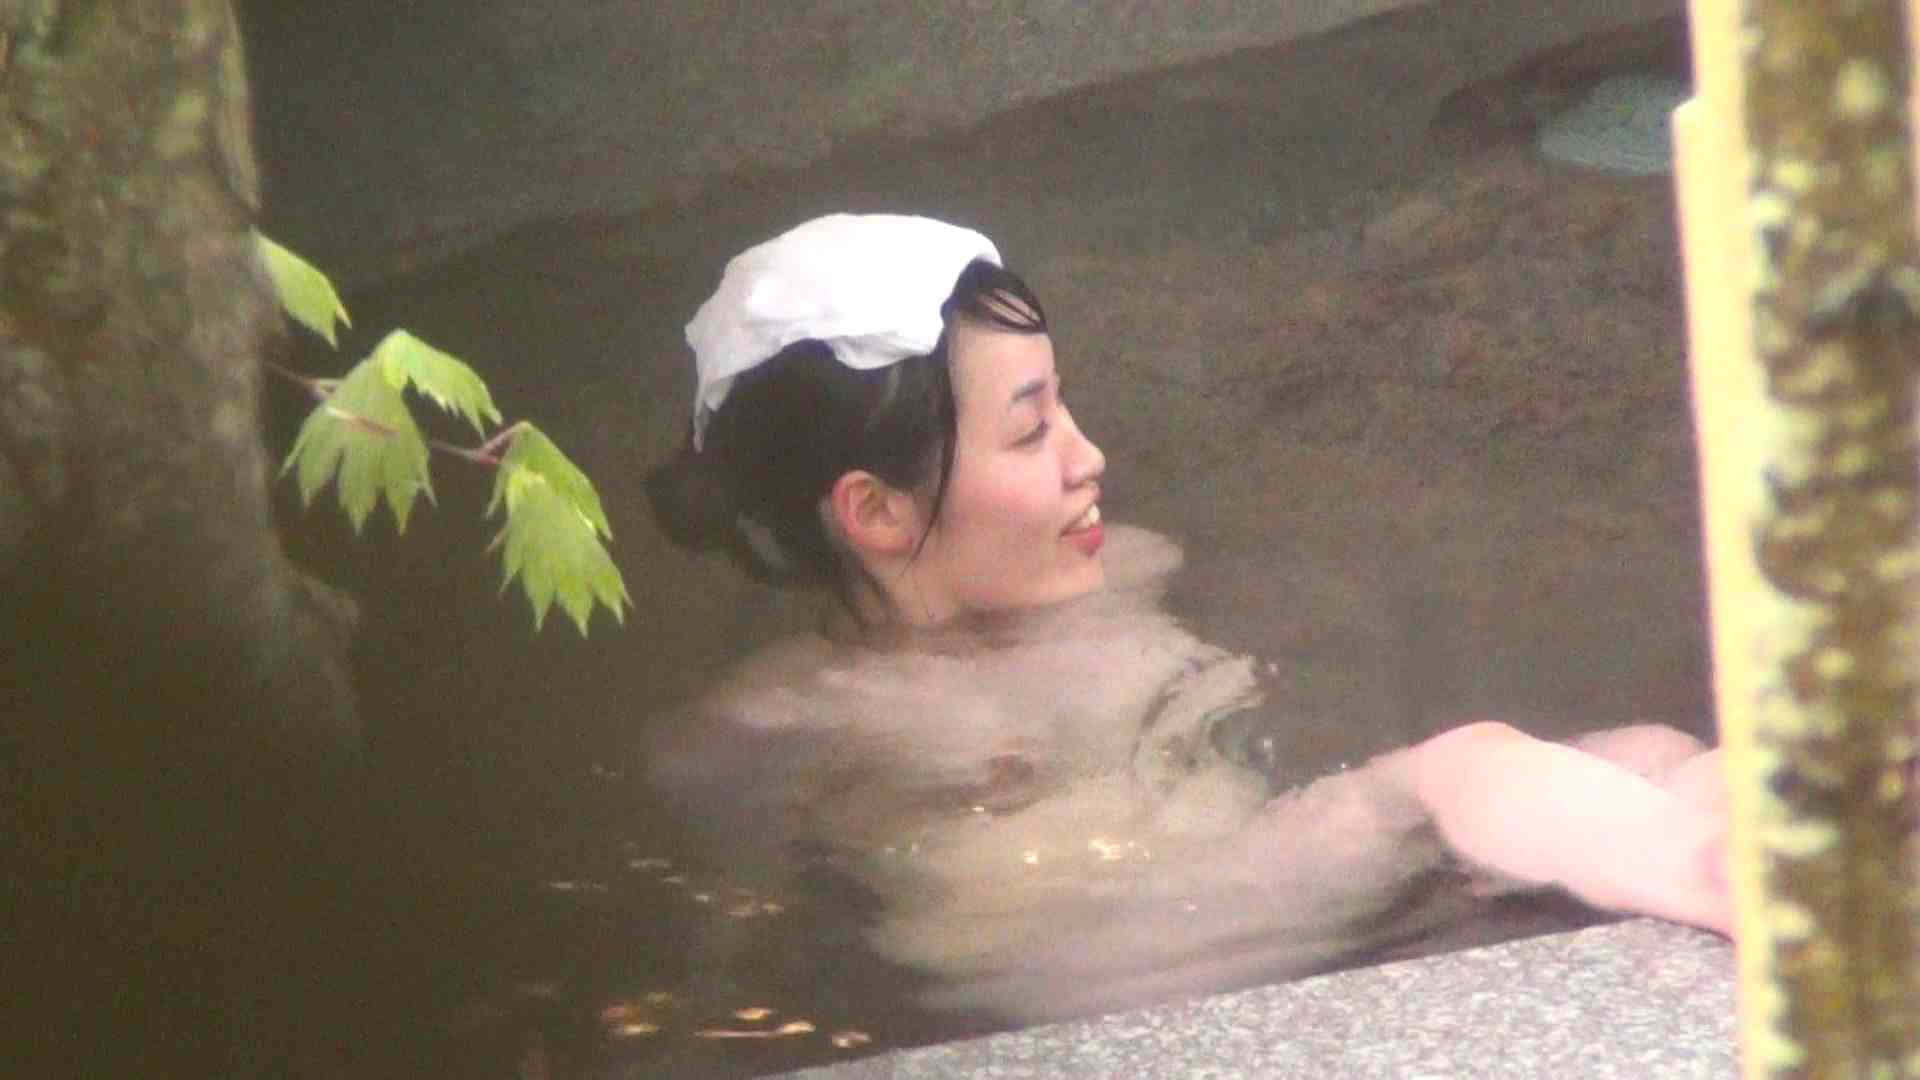 Aquaな露天風呂Vol.235 露天風呂突入 | 盗撮師作品  107pic 106